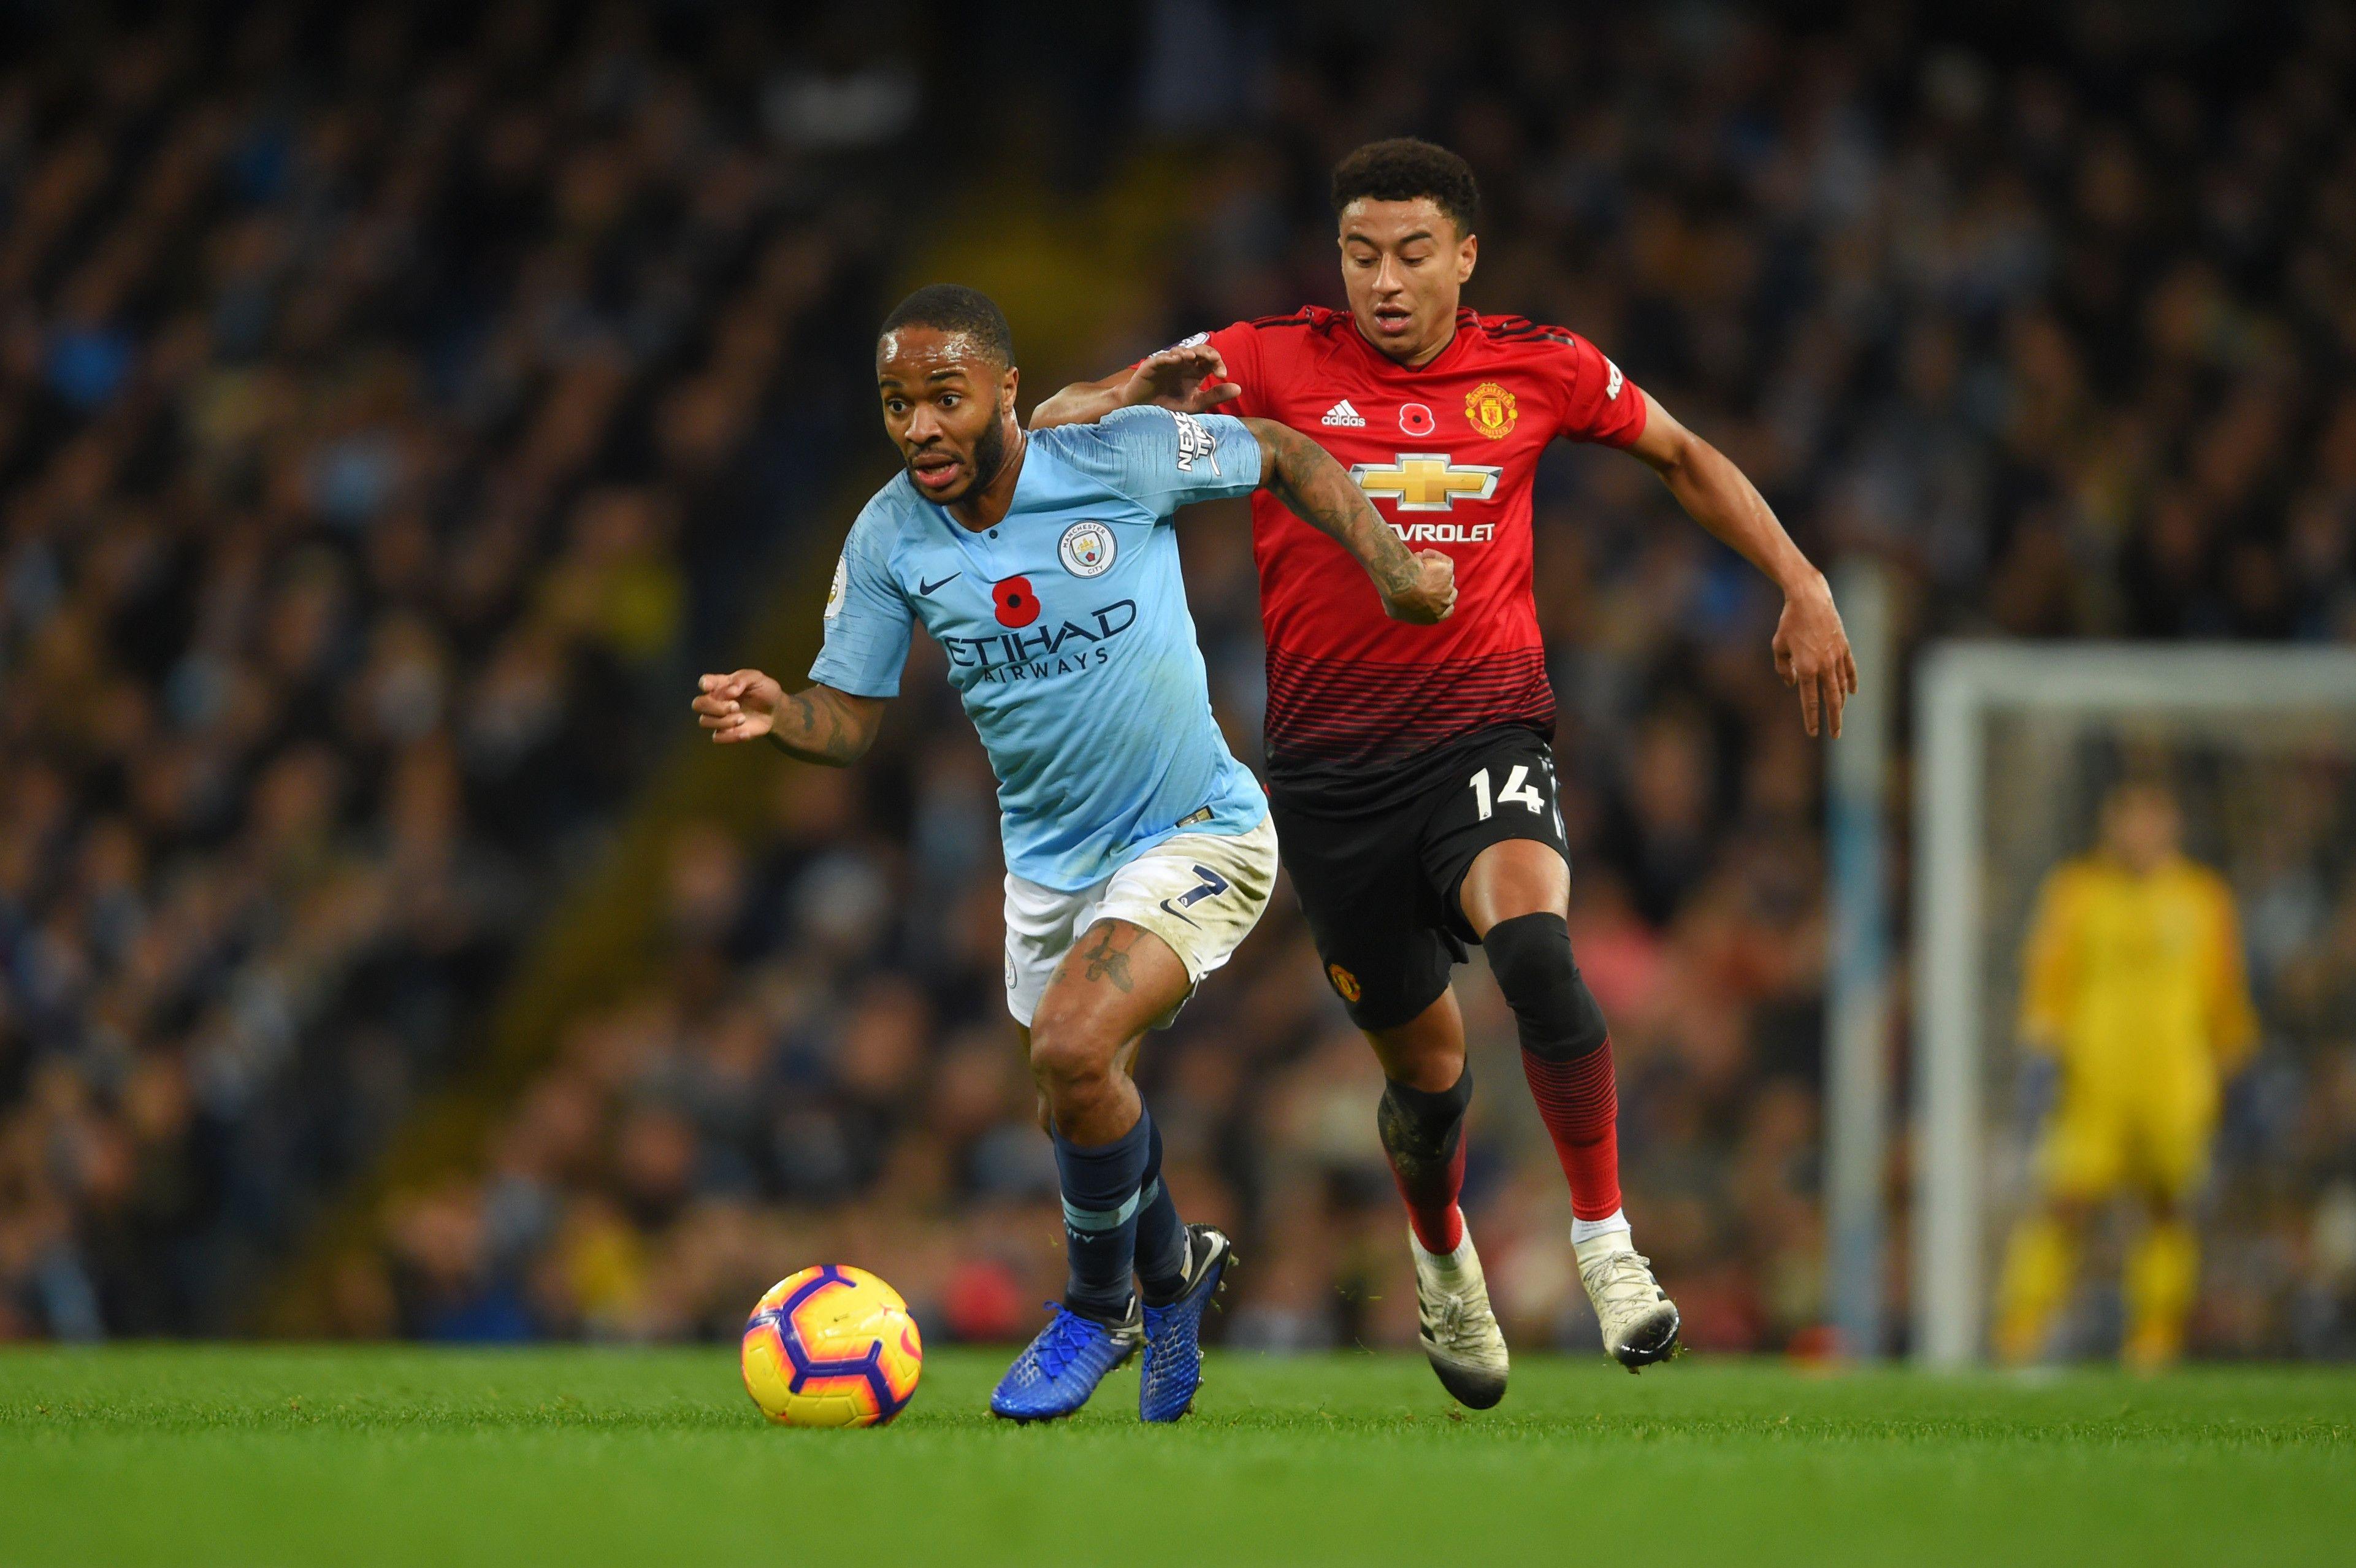 Download Manchester City Vs Manchester Utd 2019 12 07 Wapbaze Manchester City Manchester United Manchester